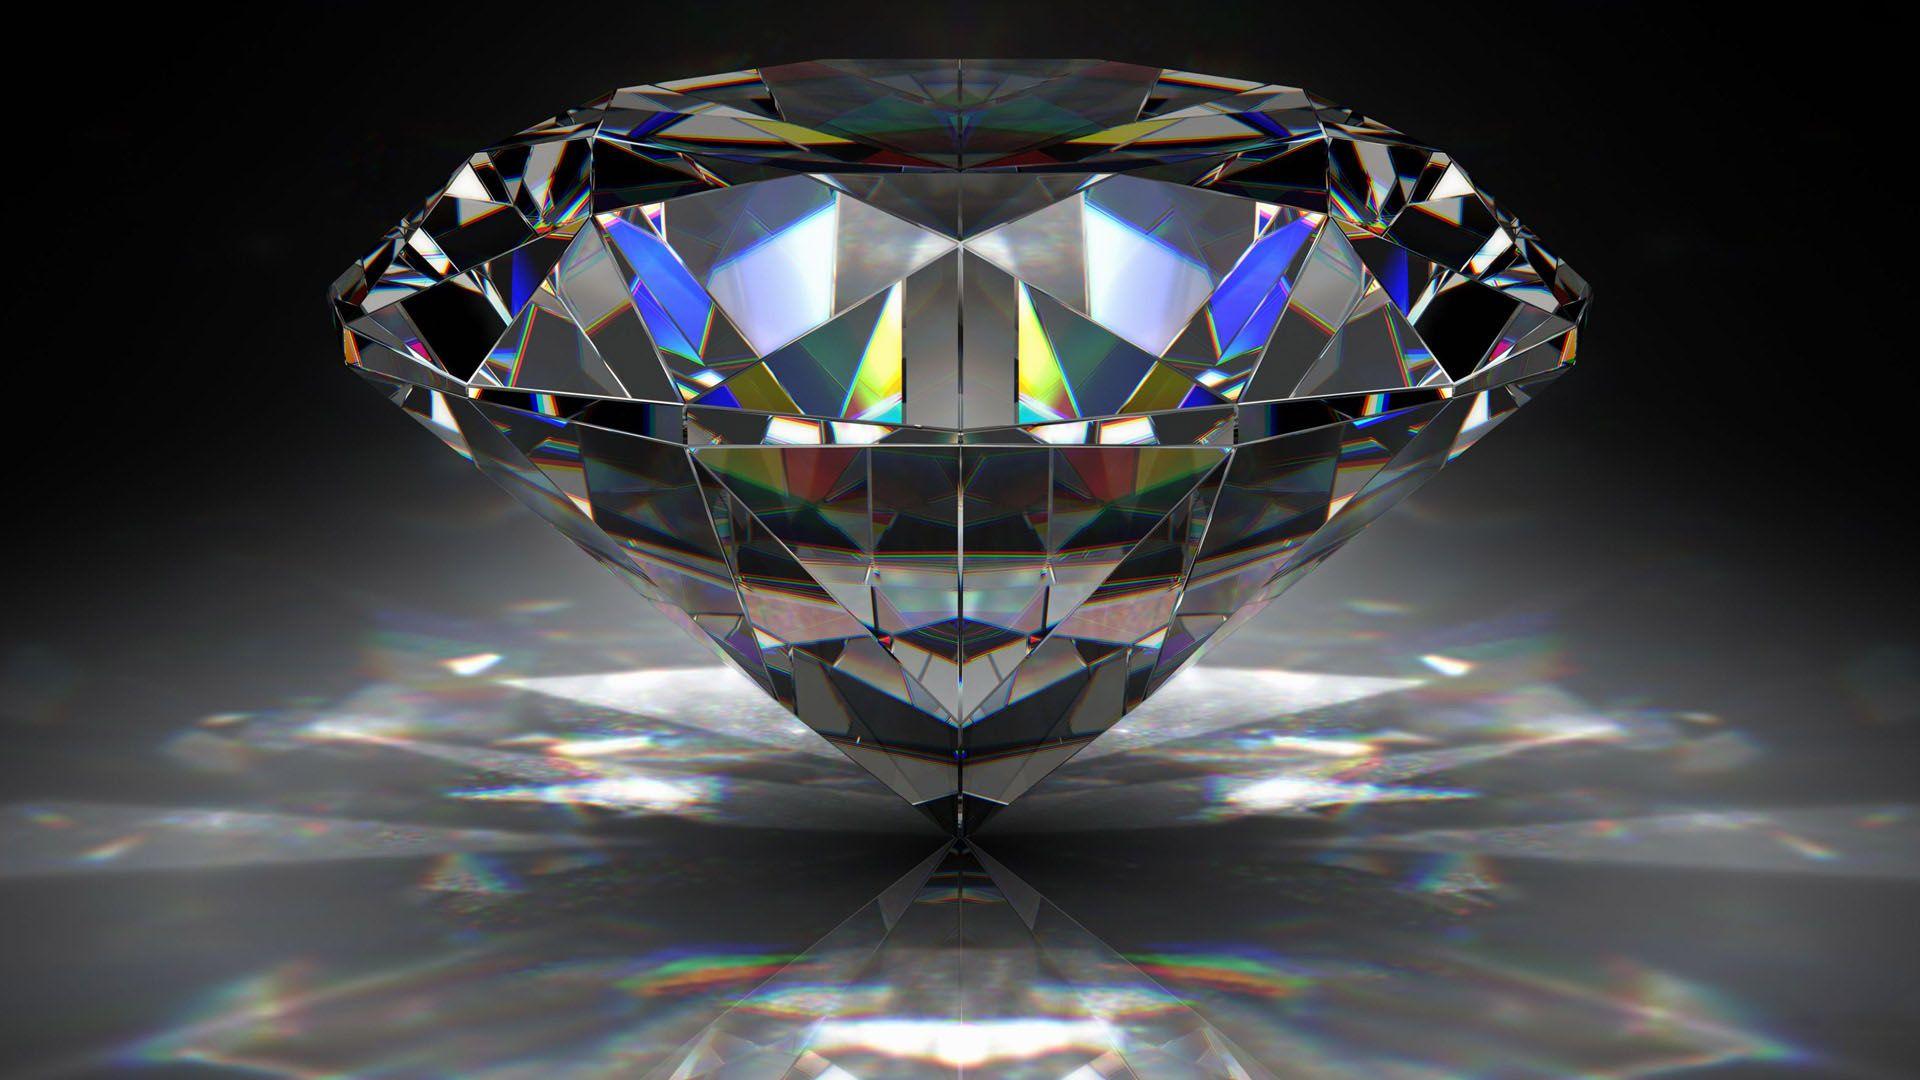 Diamond Cute Best Hd Images Diamond Wallpaper 3d Wallpaper Diamond Photography